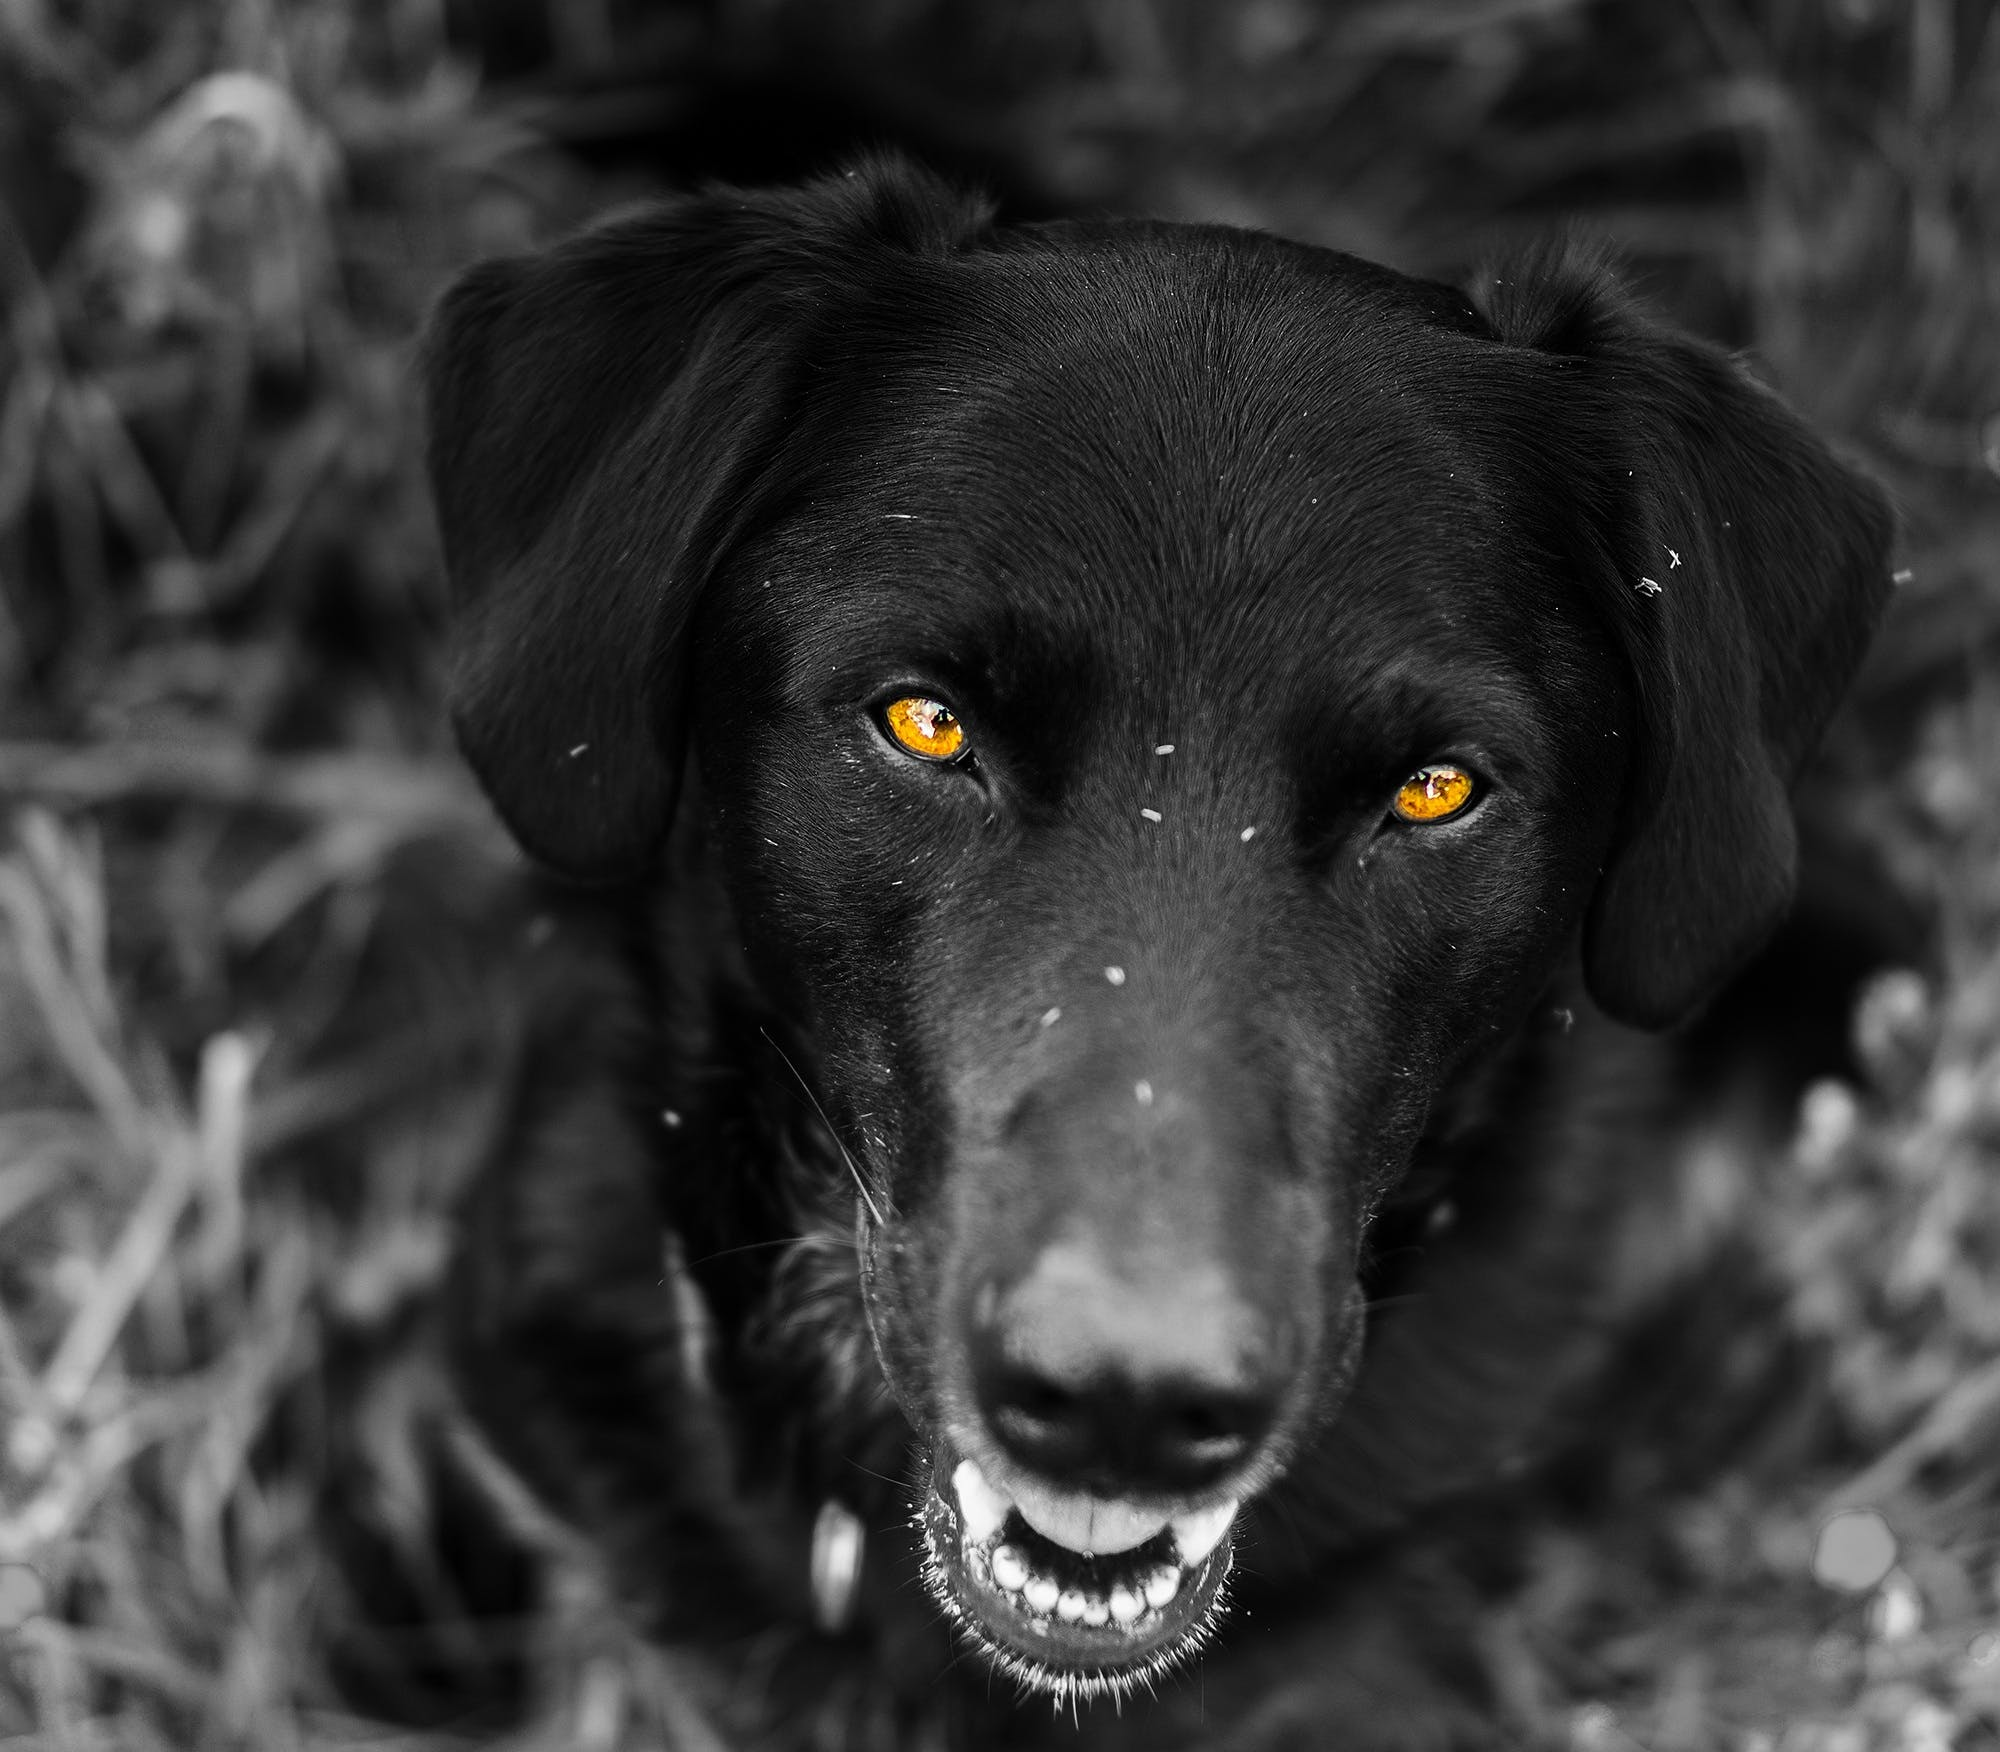 animal photography, animal portrait, blur